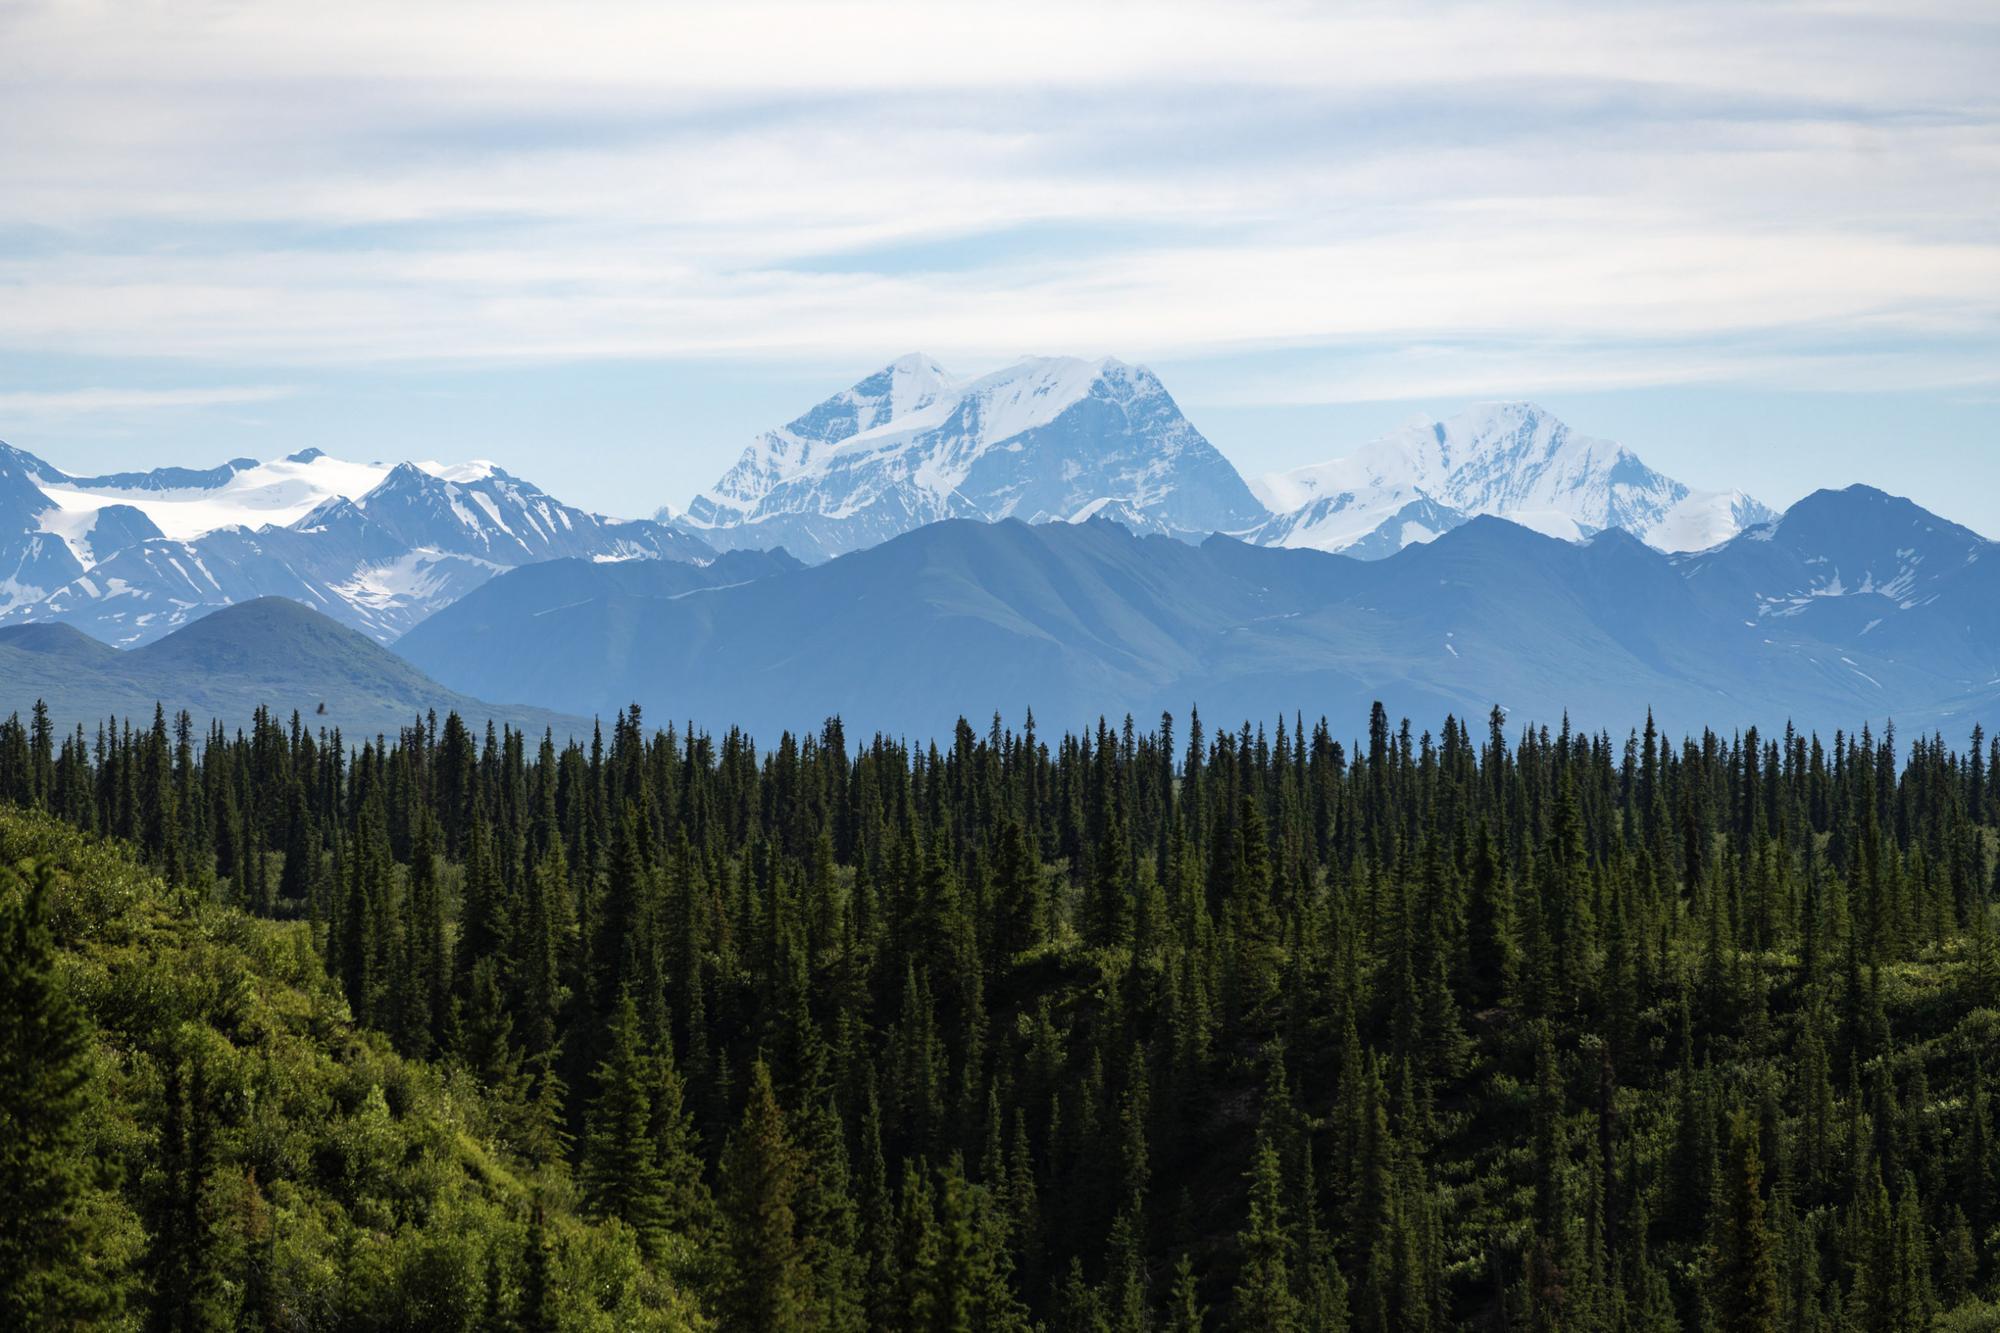 130 Miles Bicycle Touring Through Alaska: Team Mosaic on the Denali Highway